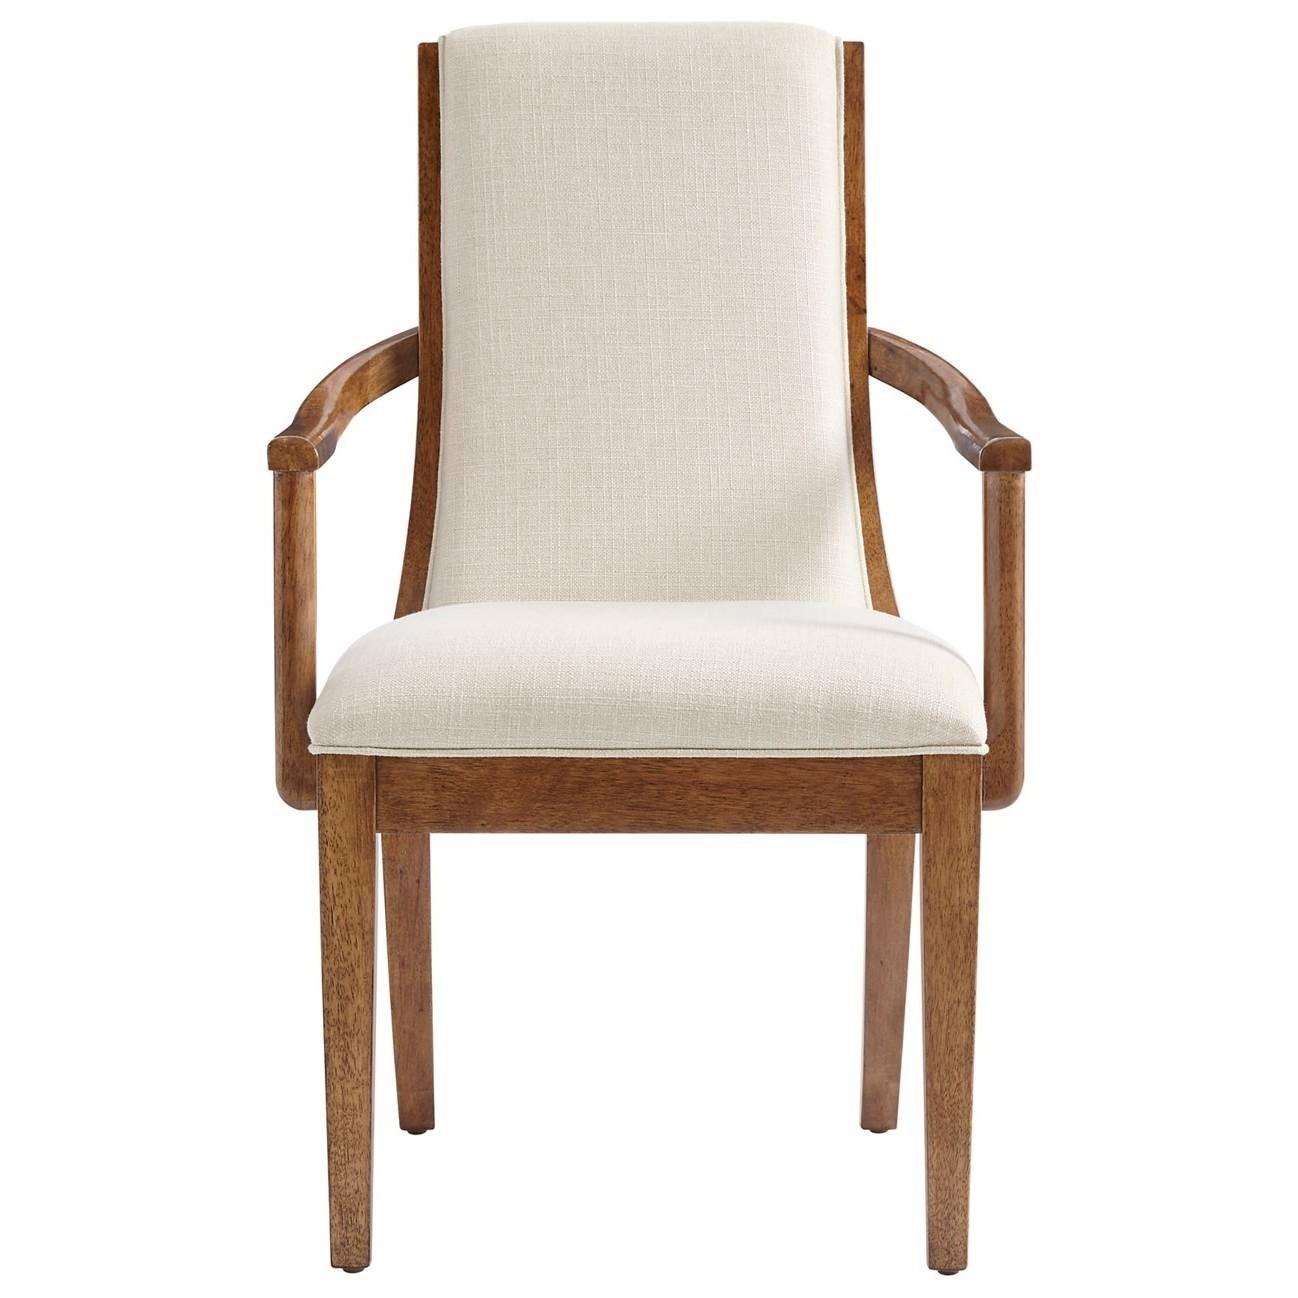 Stanley Furniture Panavista Madagascar Arm Chair - Item Number: 704-11-75